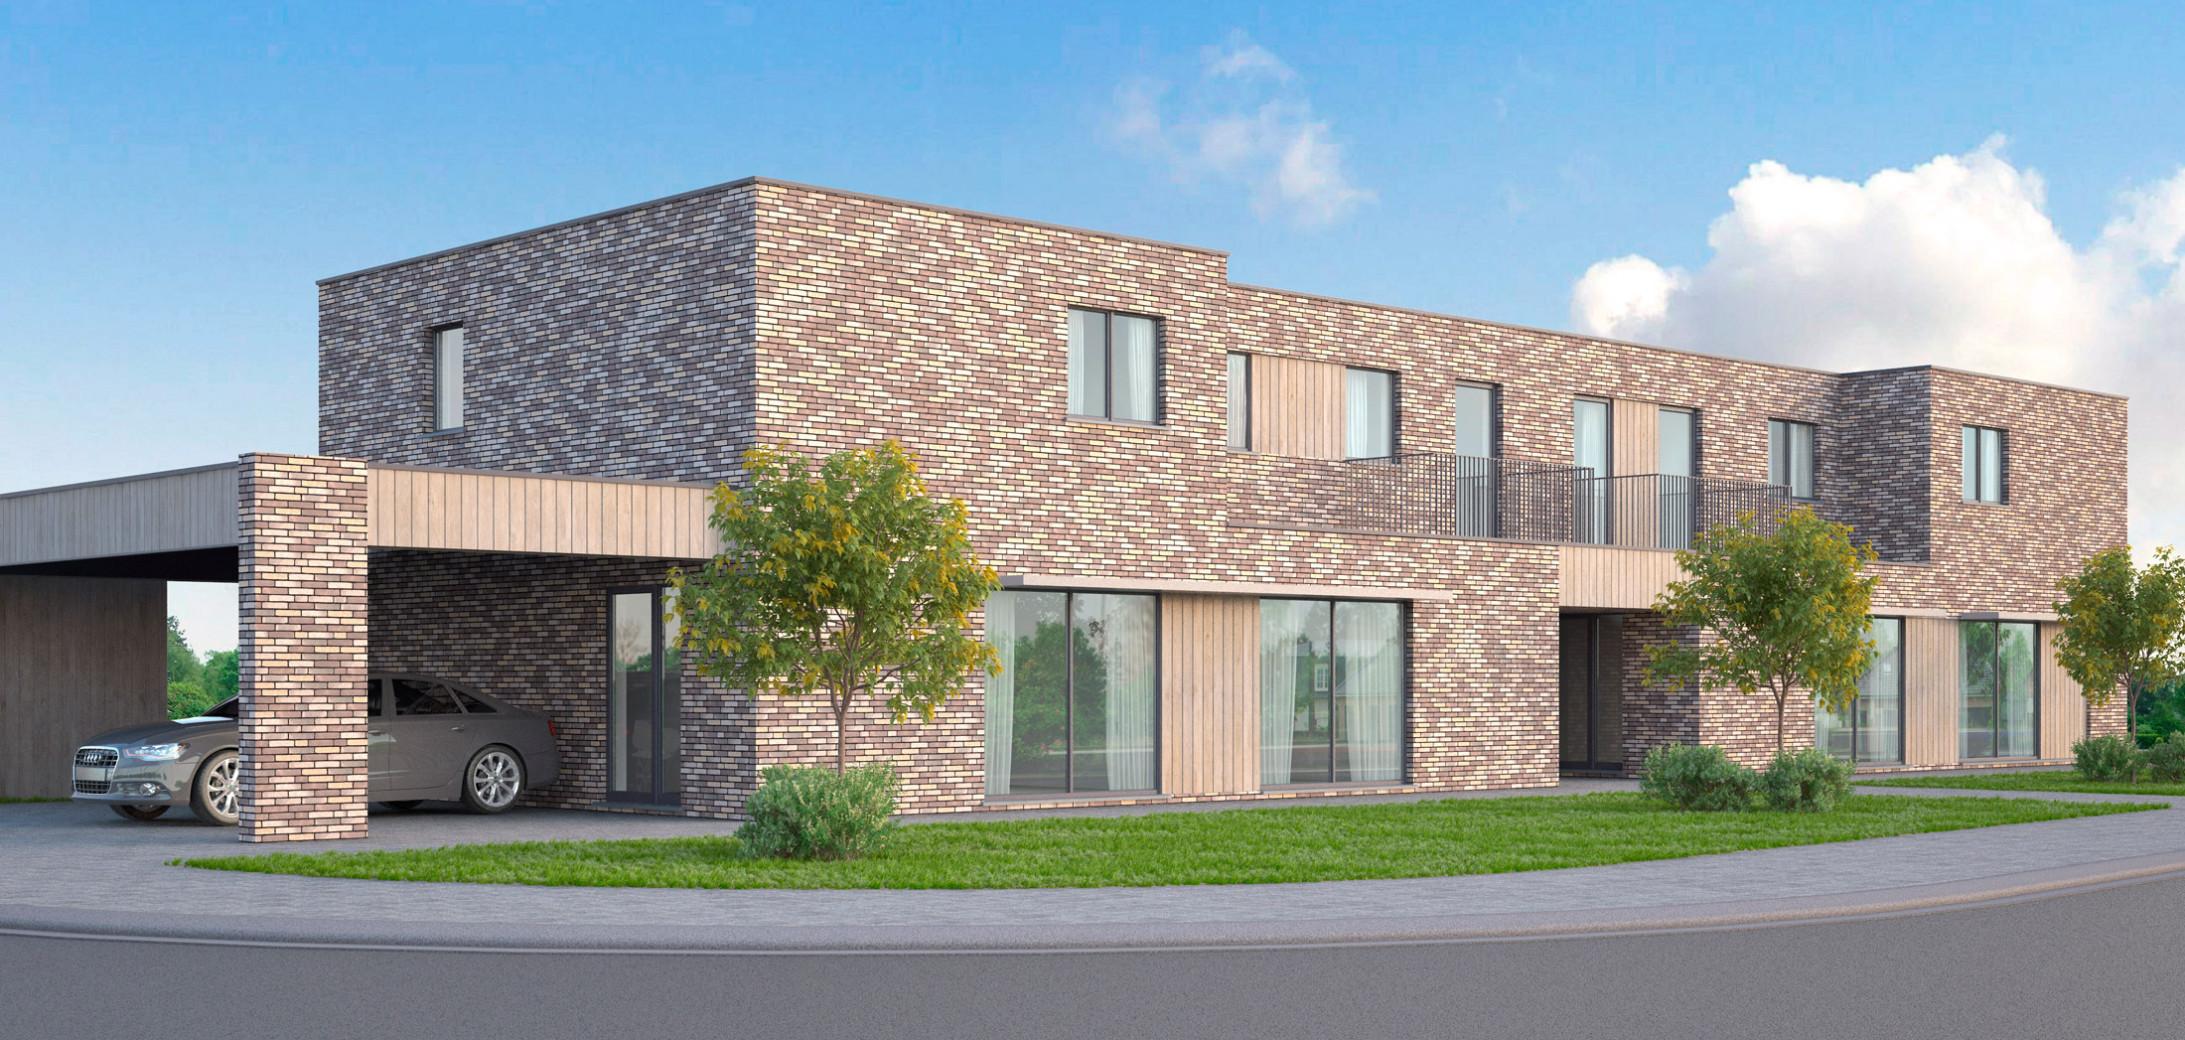 Sociale huisvesting2-Roeselare-CLaeys Architecten.jpg